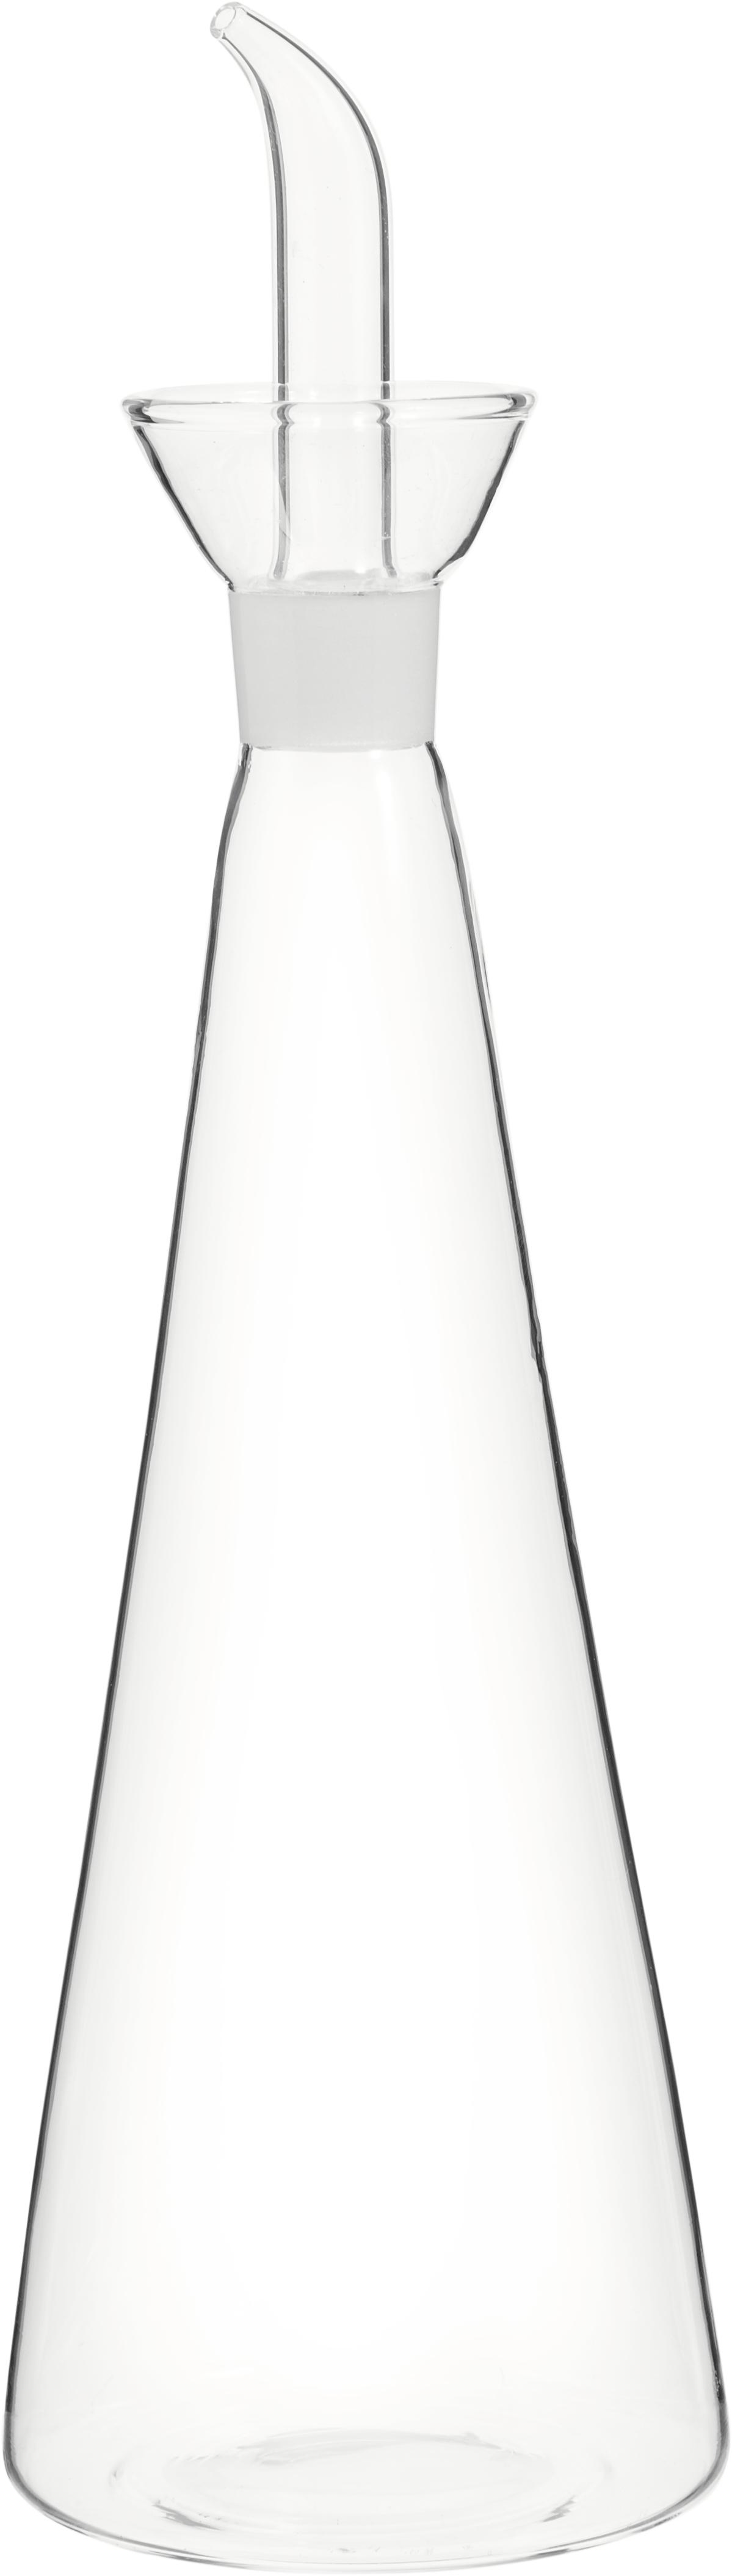 Aceitera o vinagrera Paul, Vidrio, Transparente, Al 29 cm